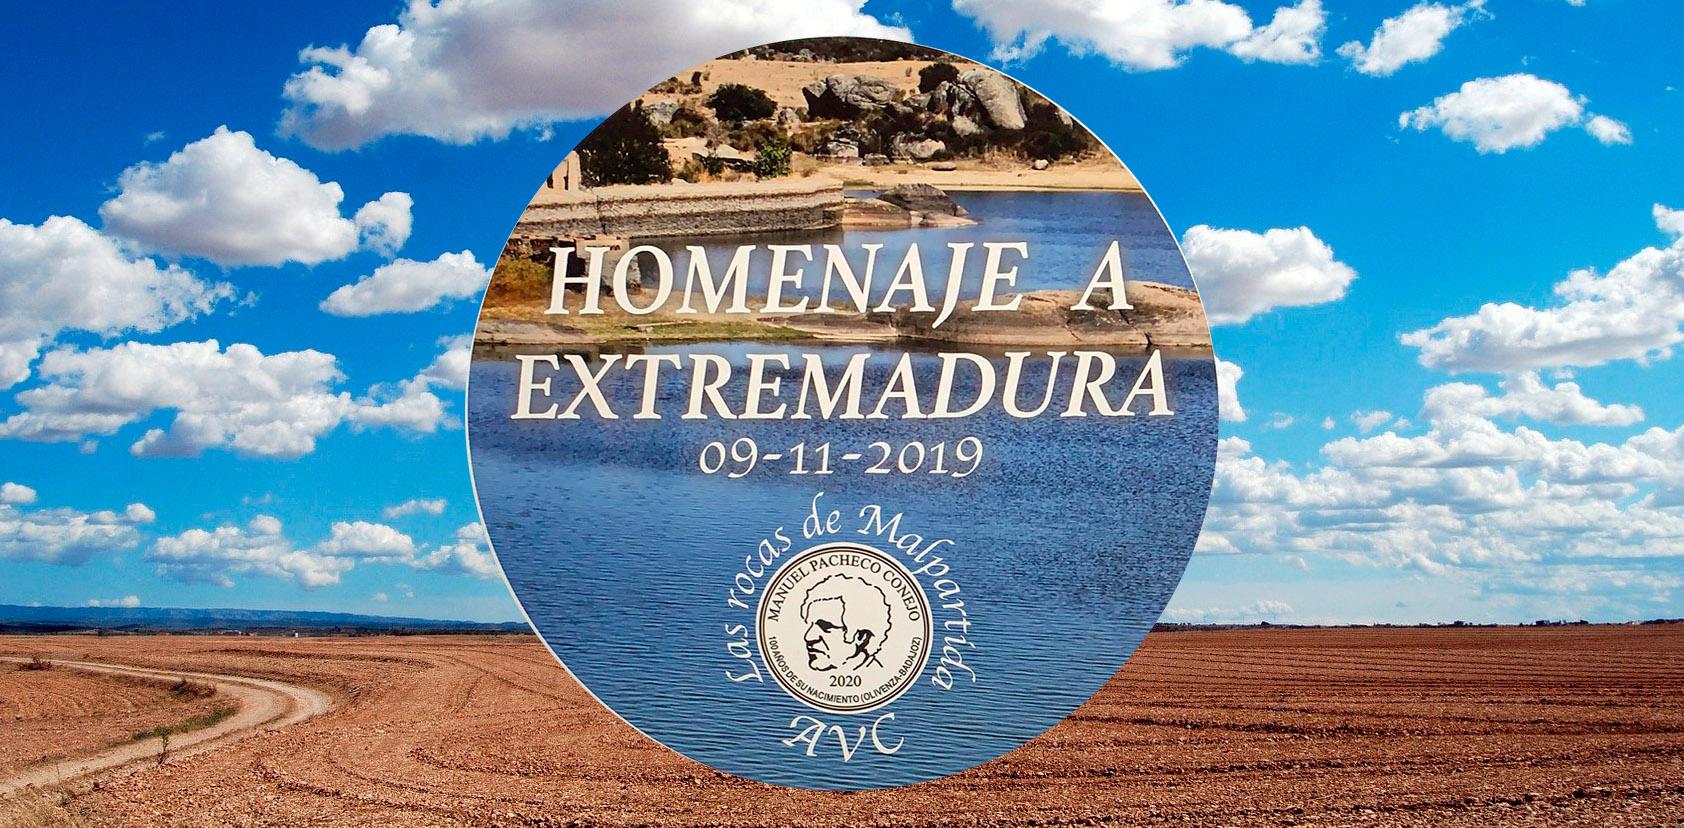 Homenaje a Extremadura 2019